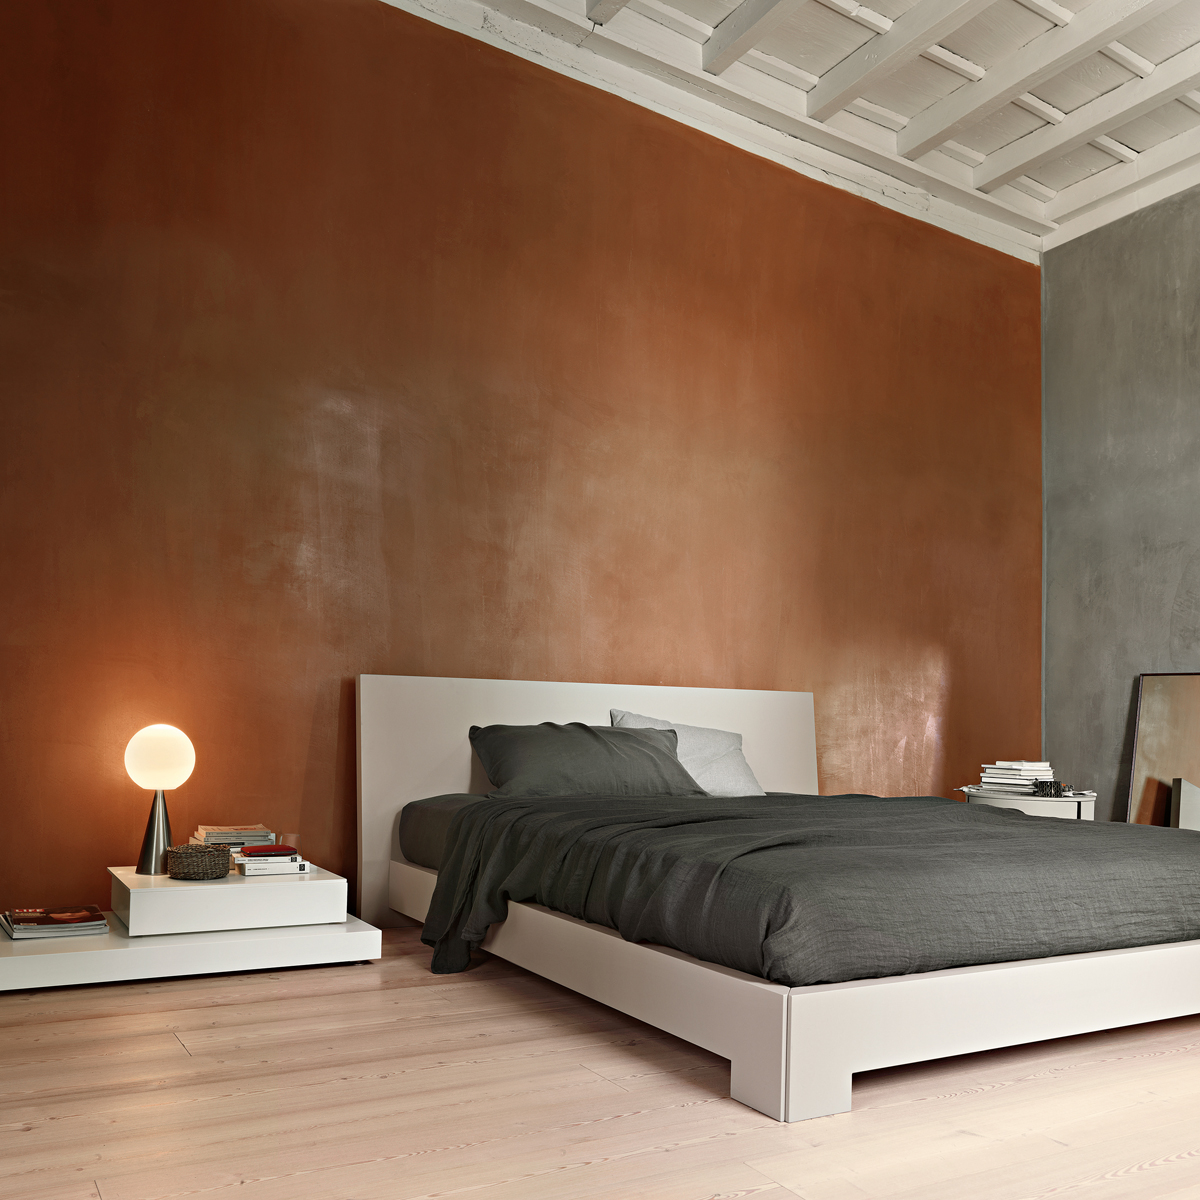 103_lema_postelja_quaranta_spalnice_artidea_sm117